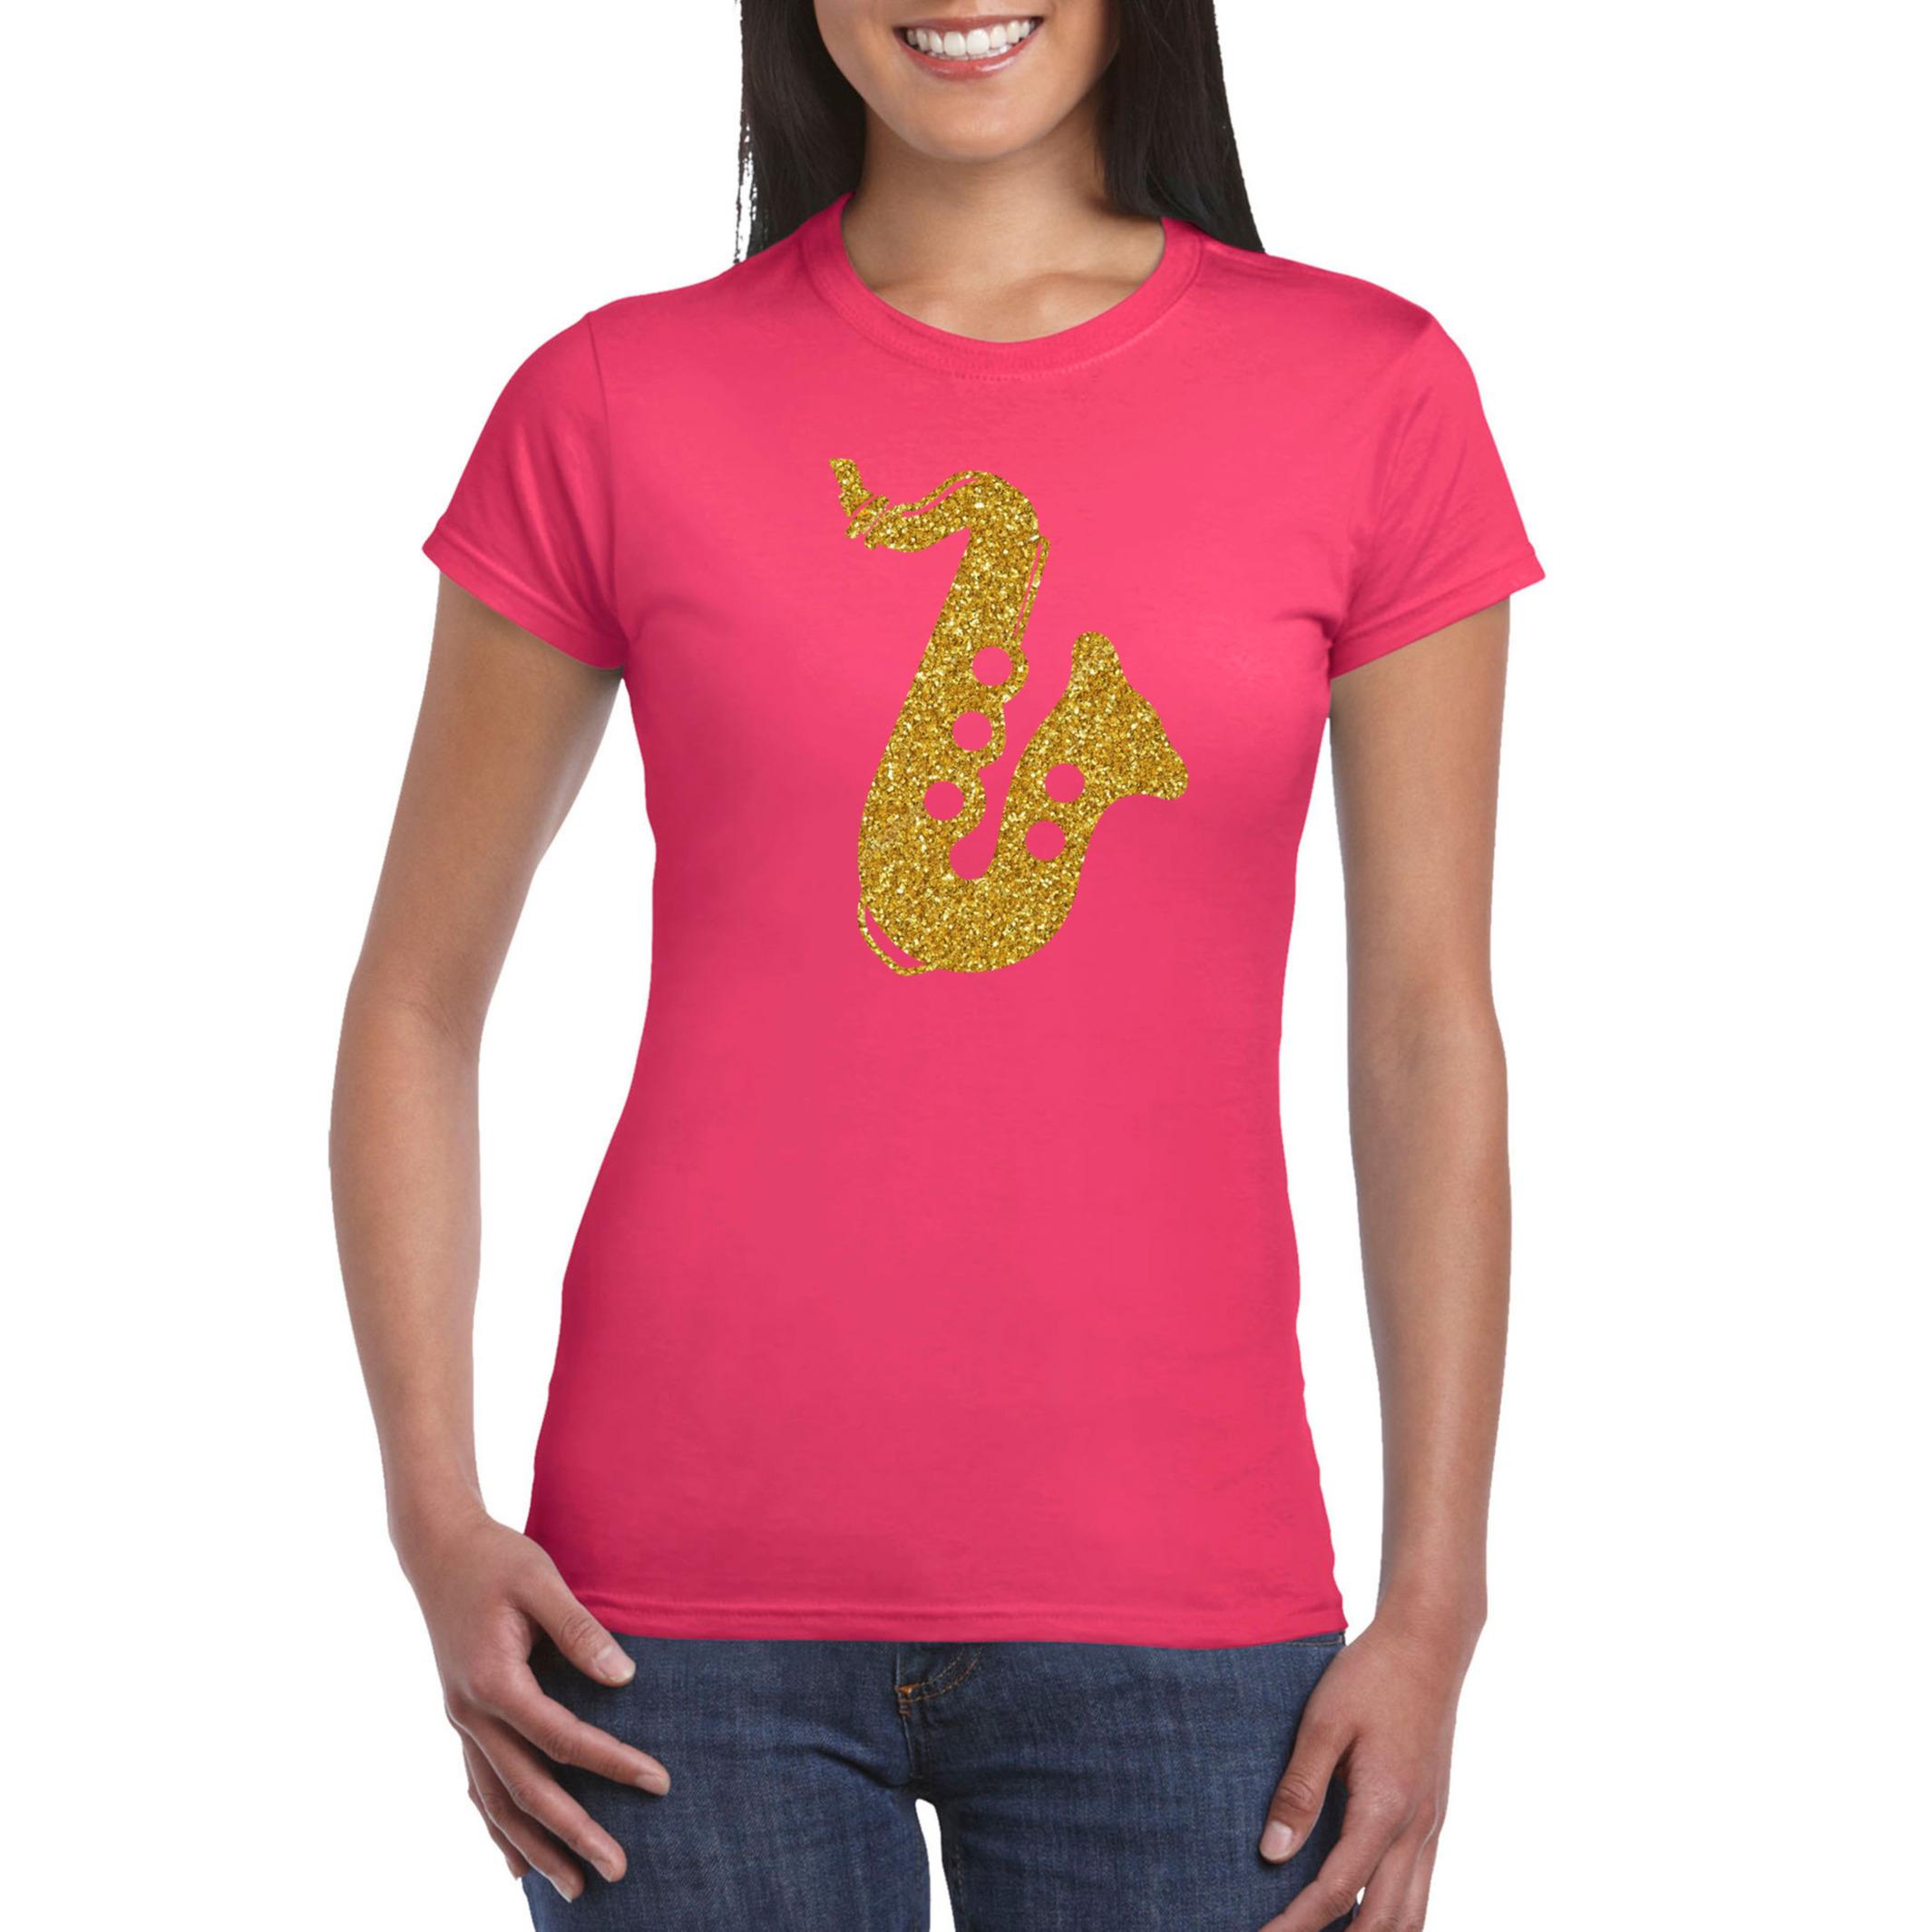 Gouden muziek saxofoon t-shirt roze voor dames - saxofonisten outfit